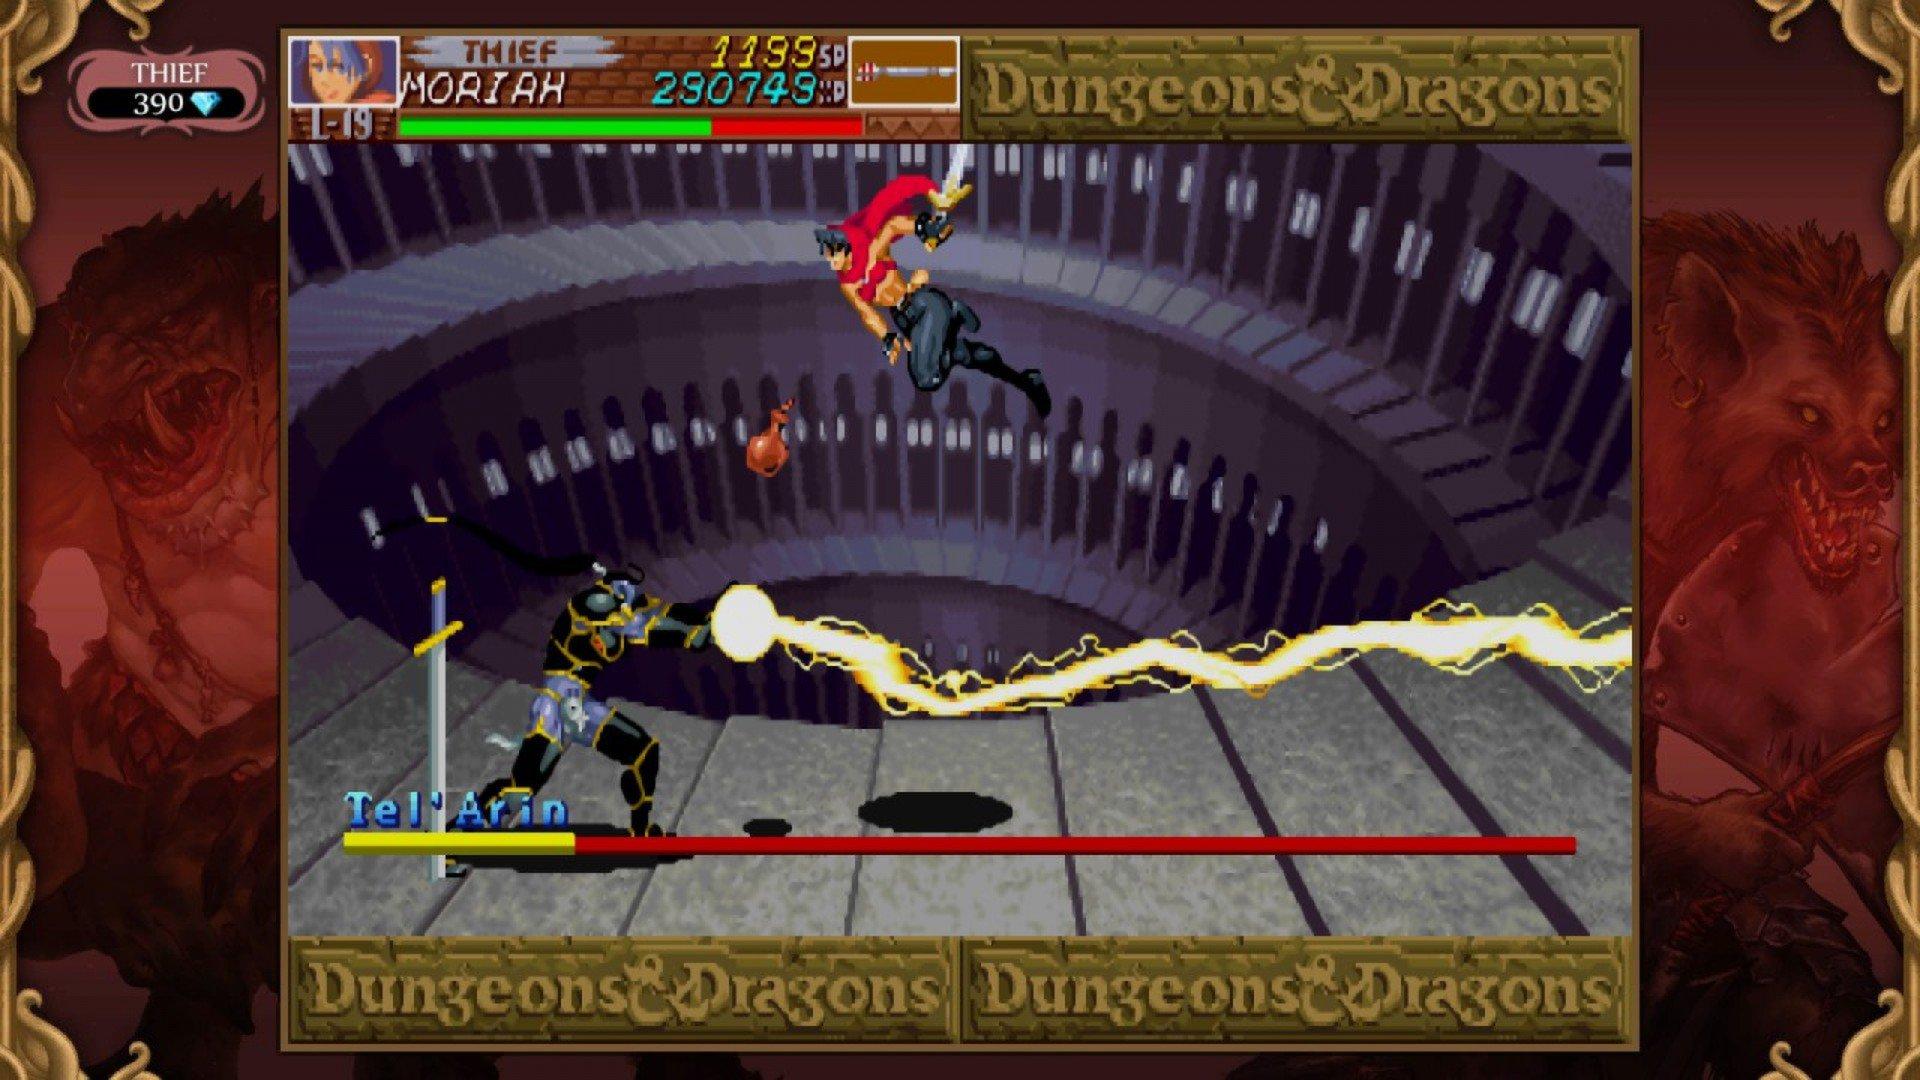 Dungeons & Dragons Chronicles of Mystara 7